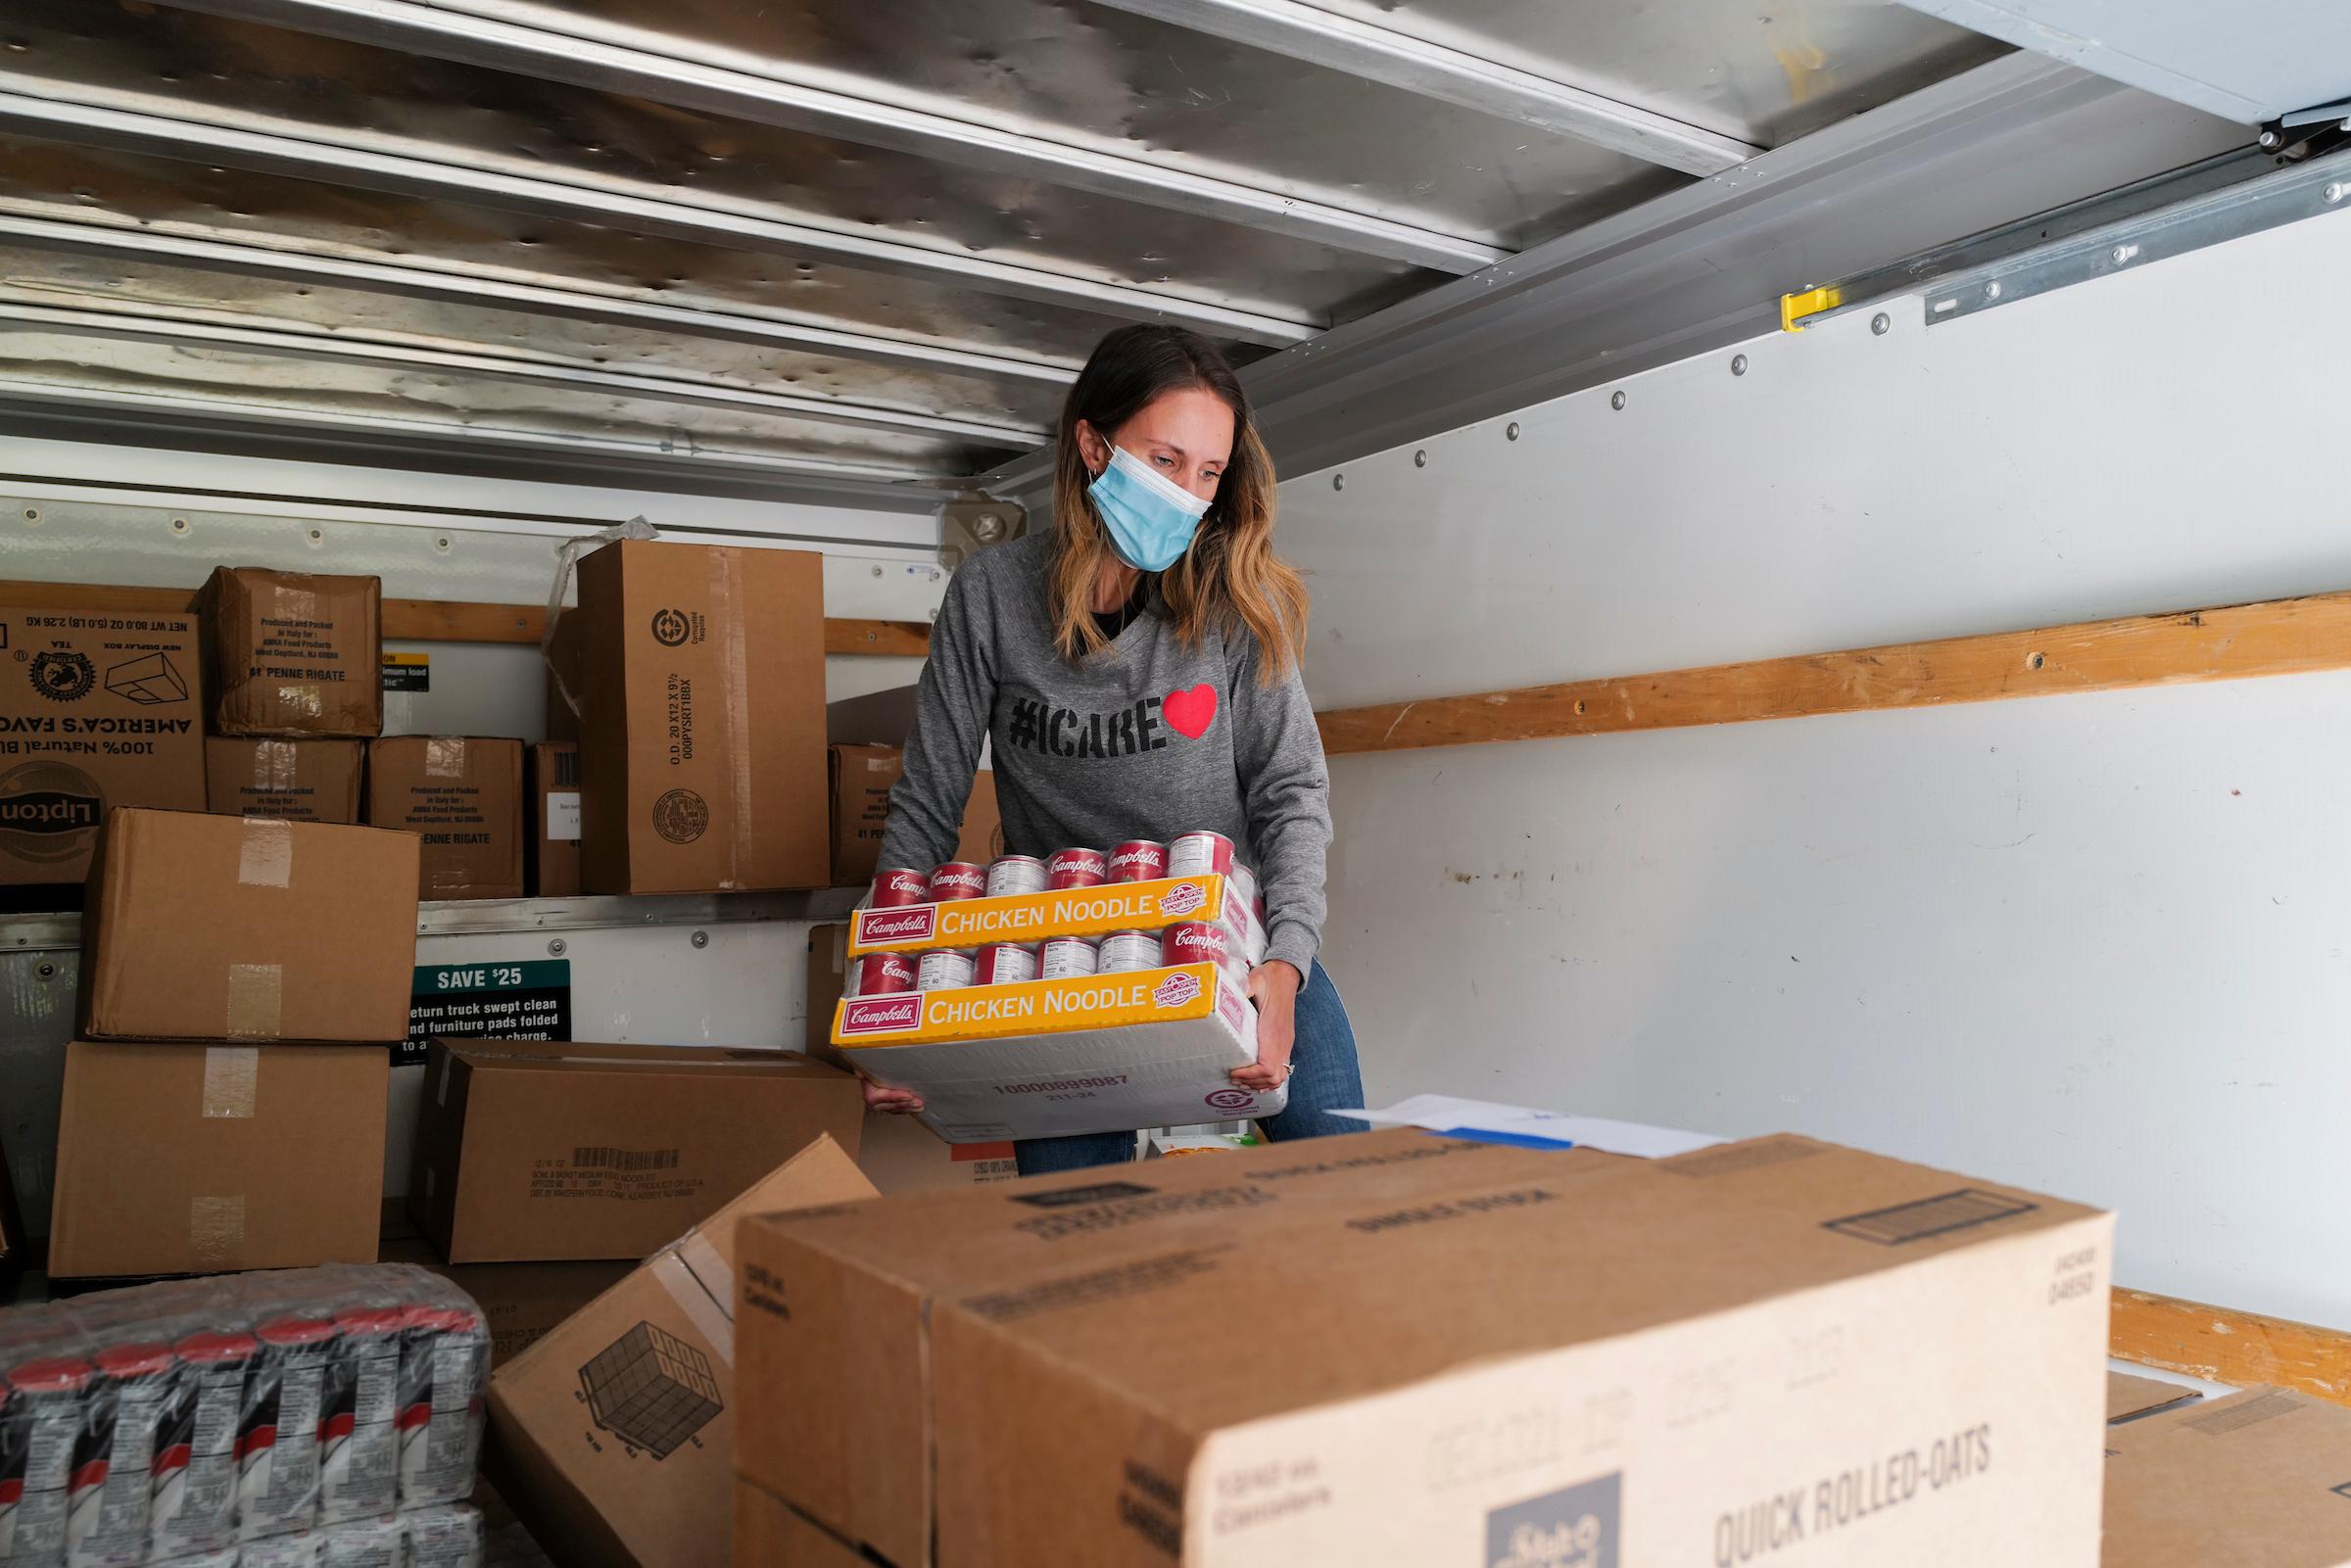 Marit Molin helps with food distribution through her organization, Hamptons Community Outreach.  LORI HAWKINS